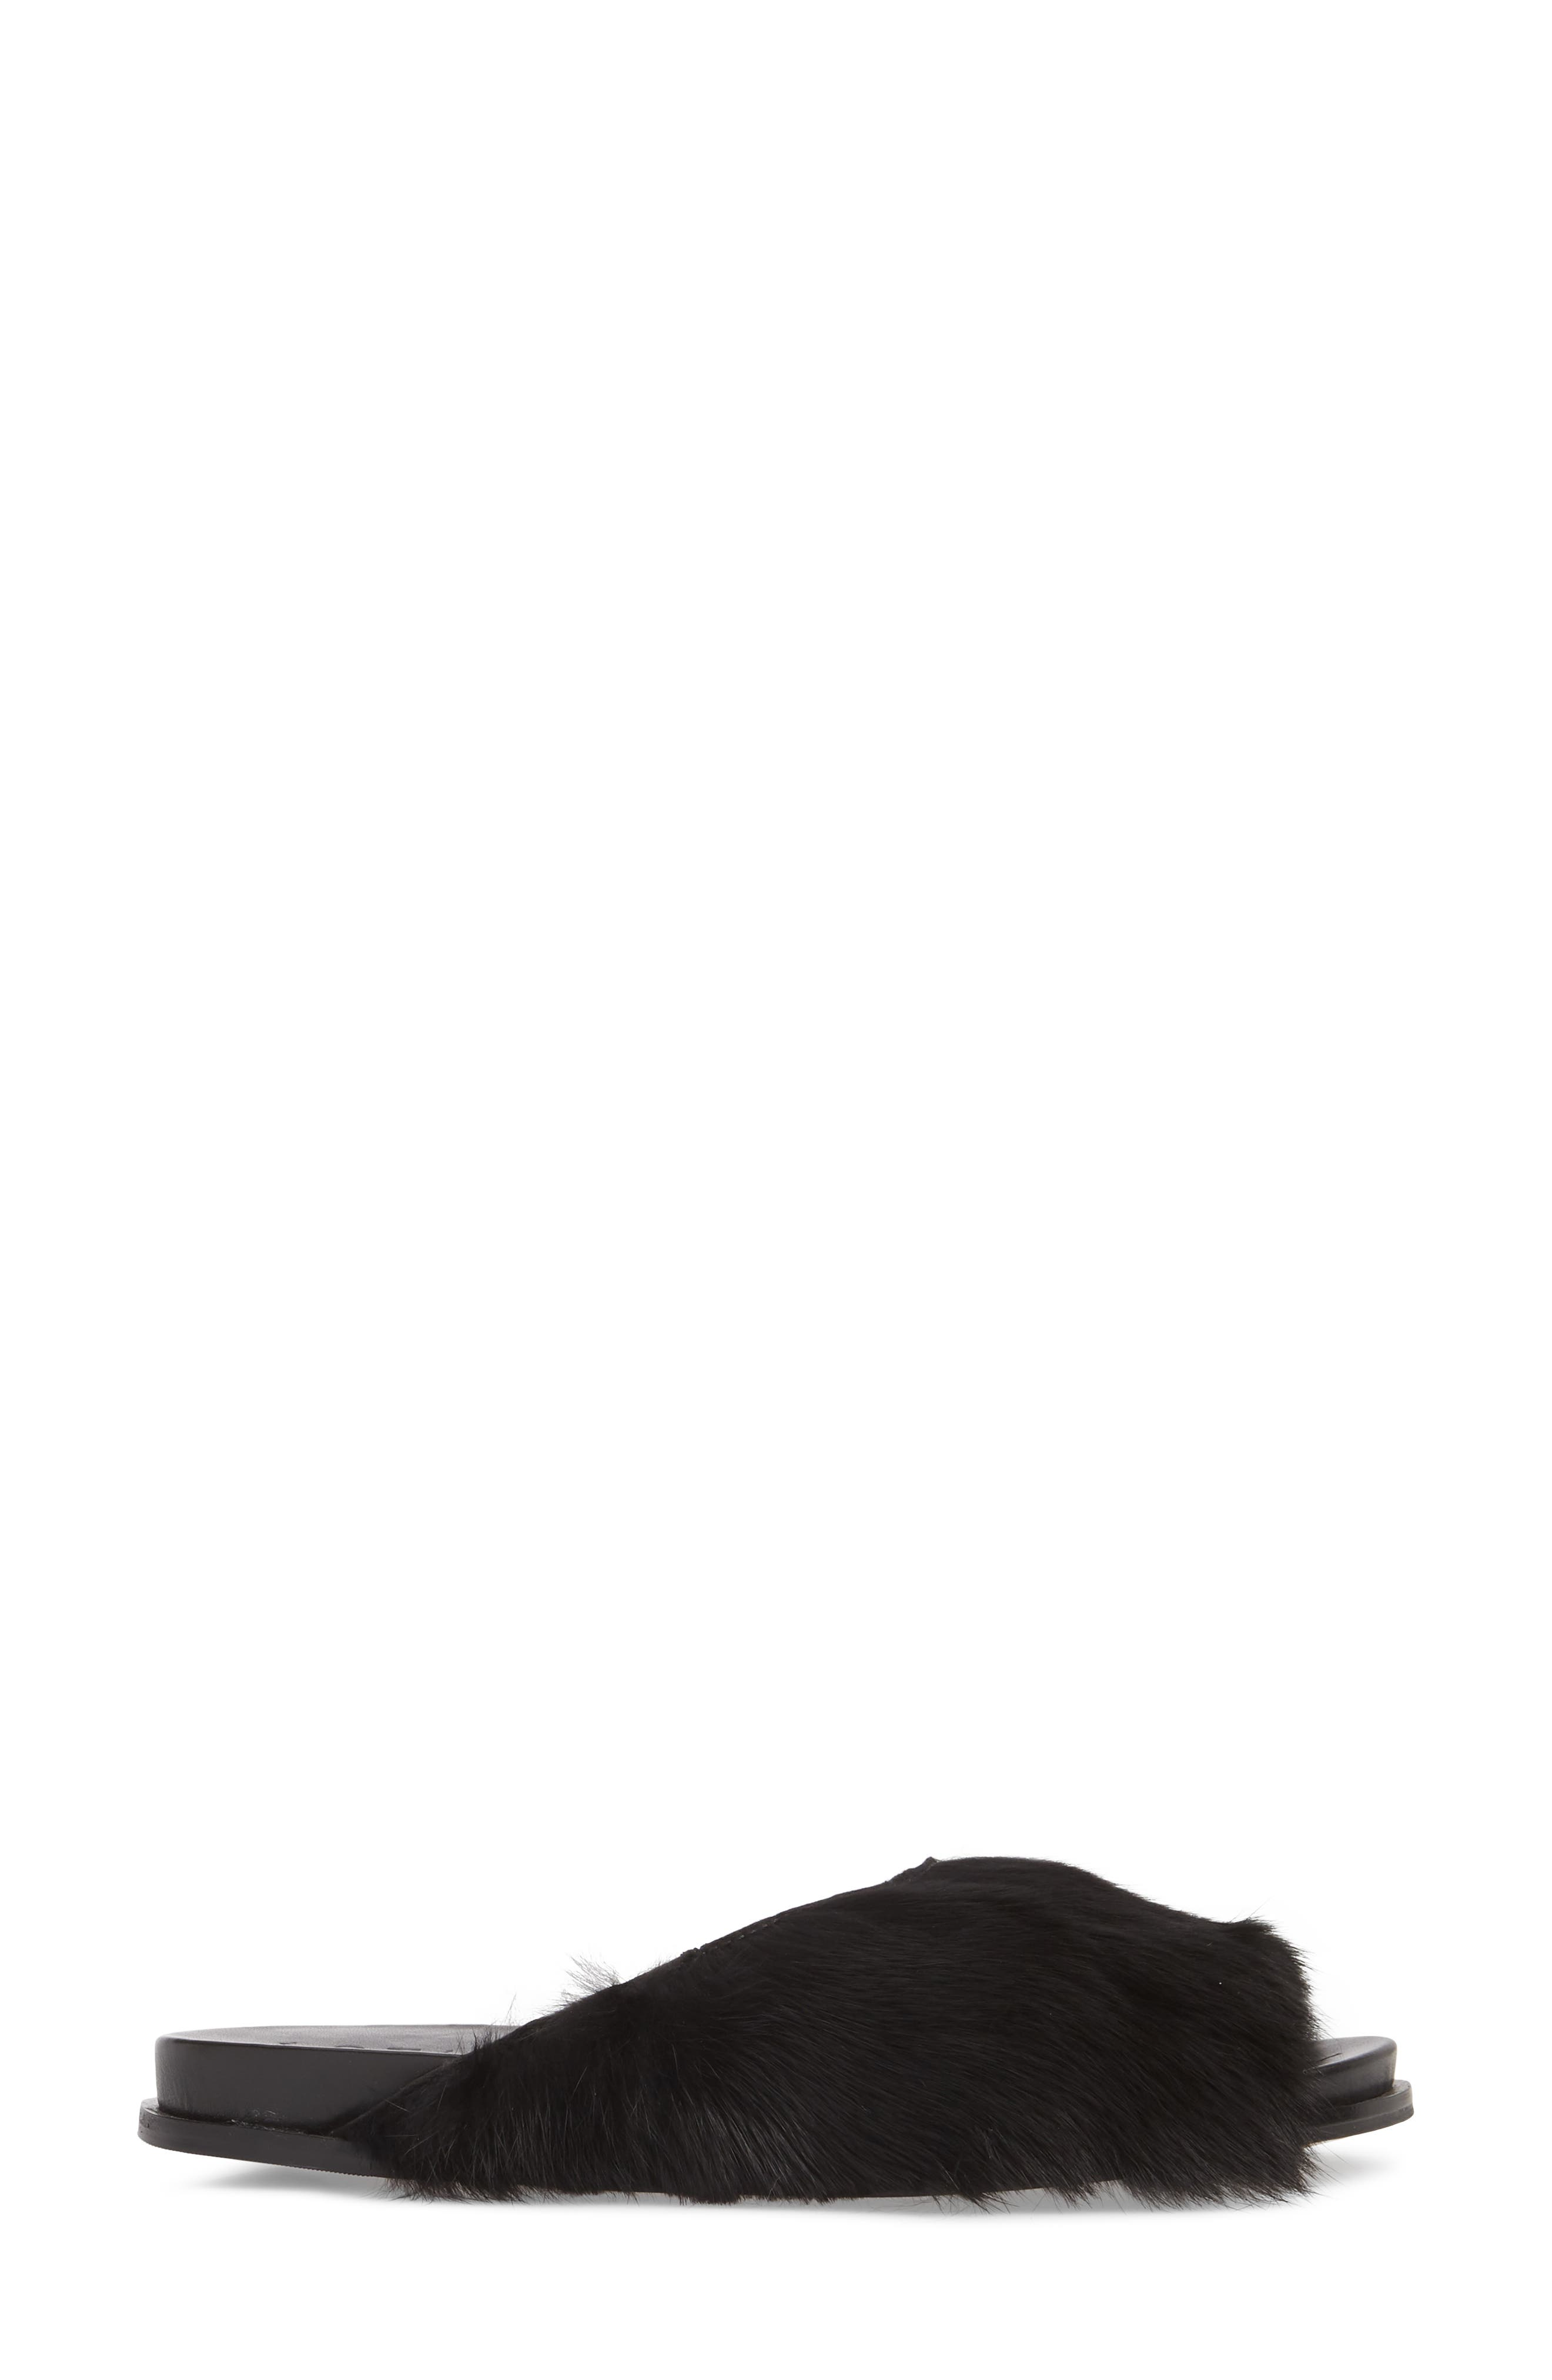 Onora Genuine Rabbit Fur Slide Sandal,                             Alternate thumbnail 3, color,                             Black Rabbit Fur